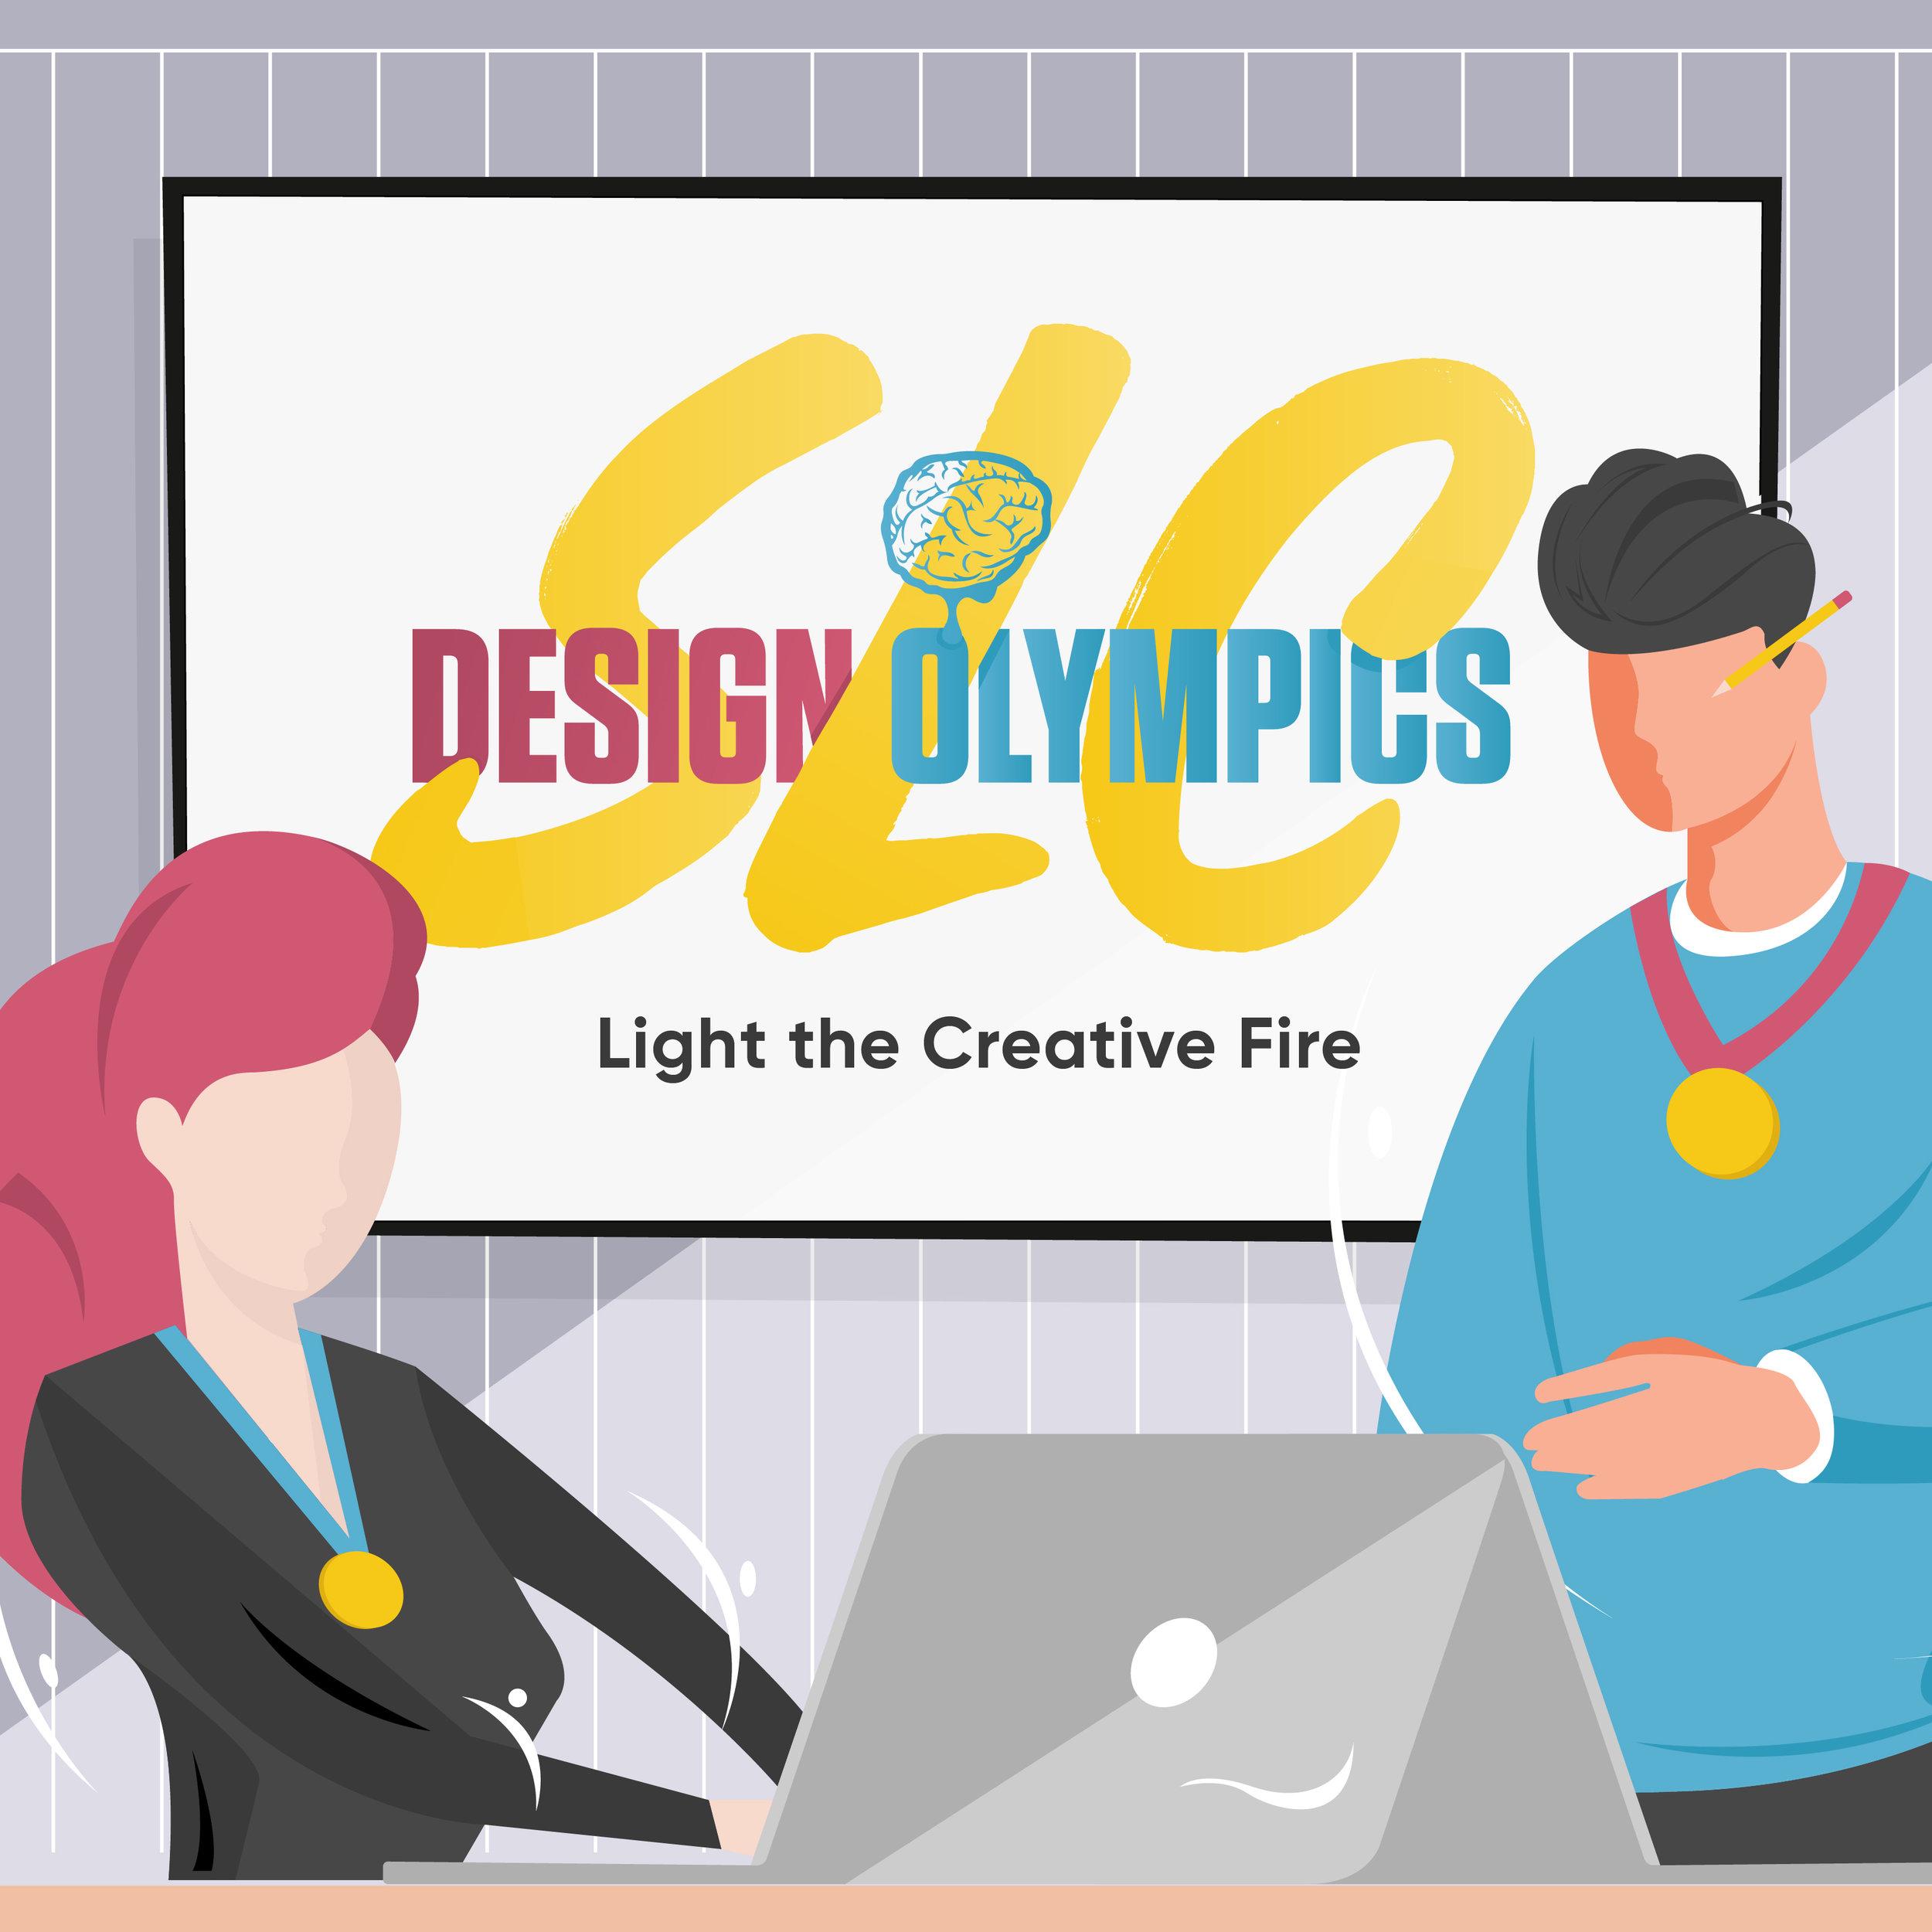 The Salt Lake City Graphic Design Olympics